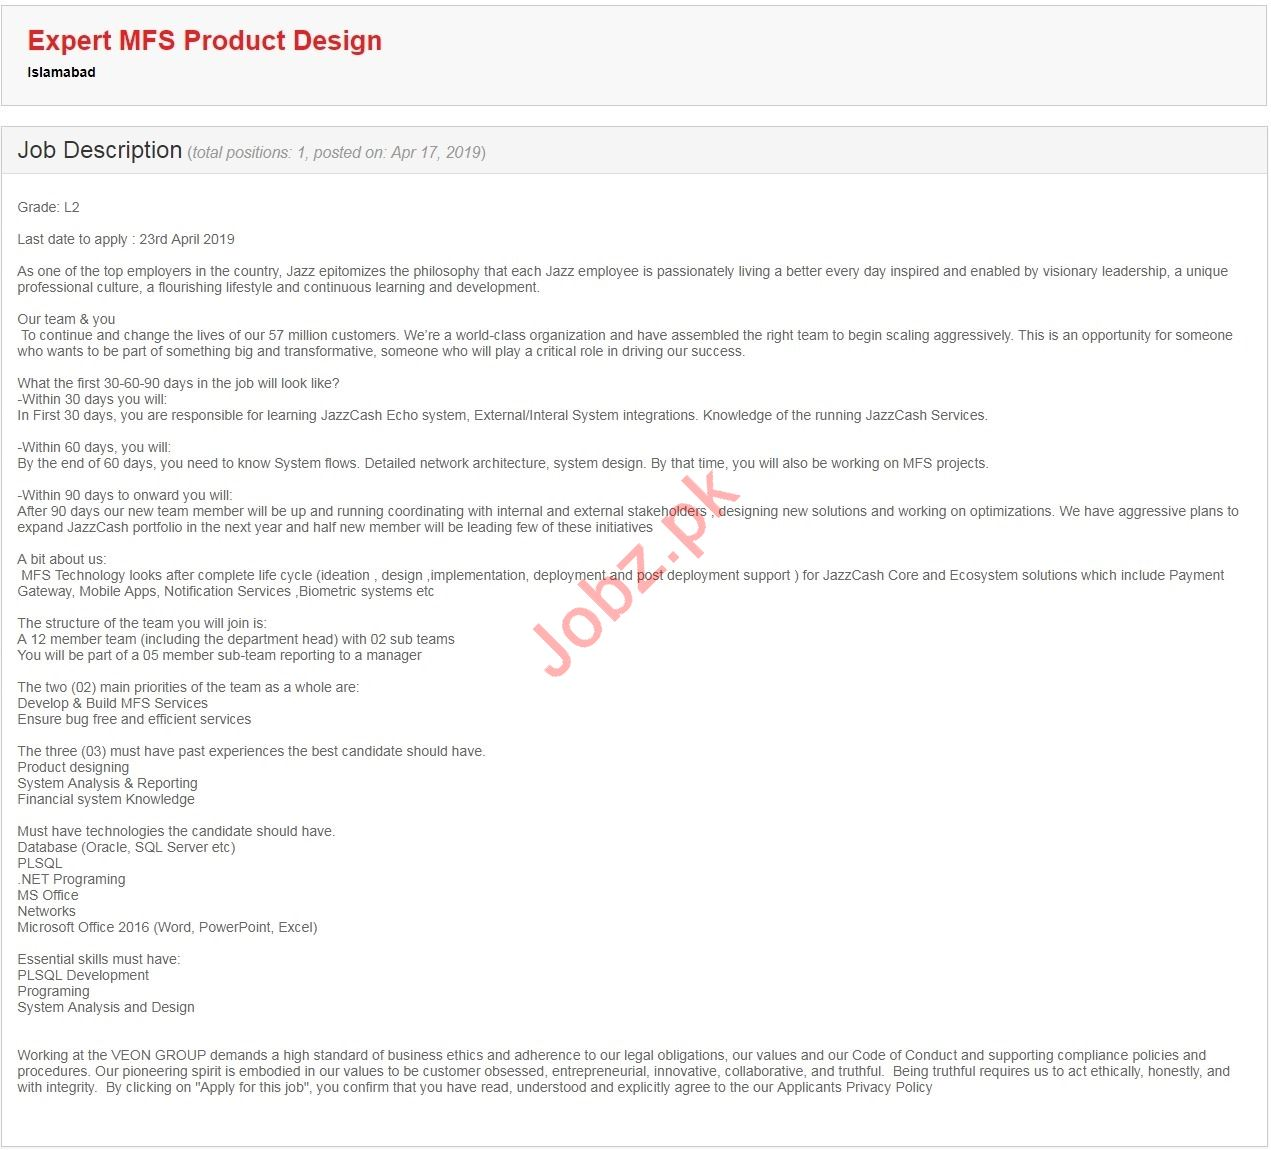 Expert MFS Product Design Jobs in Jazz Telecommunication